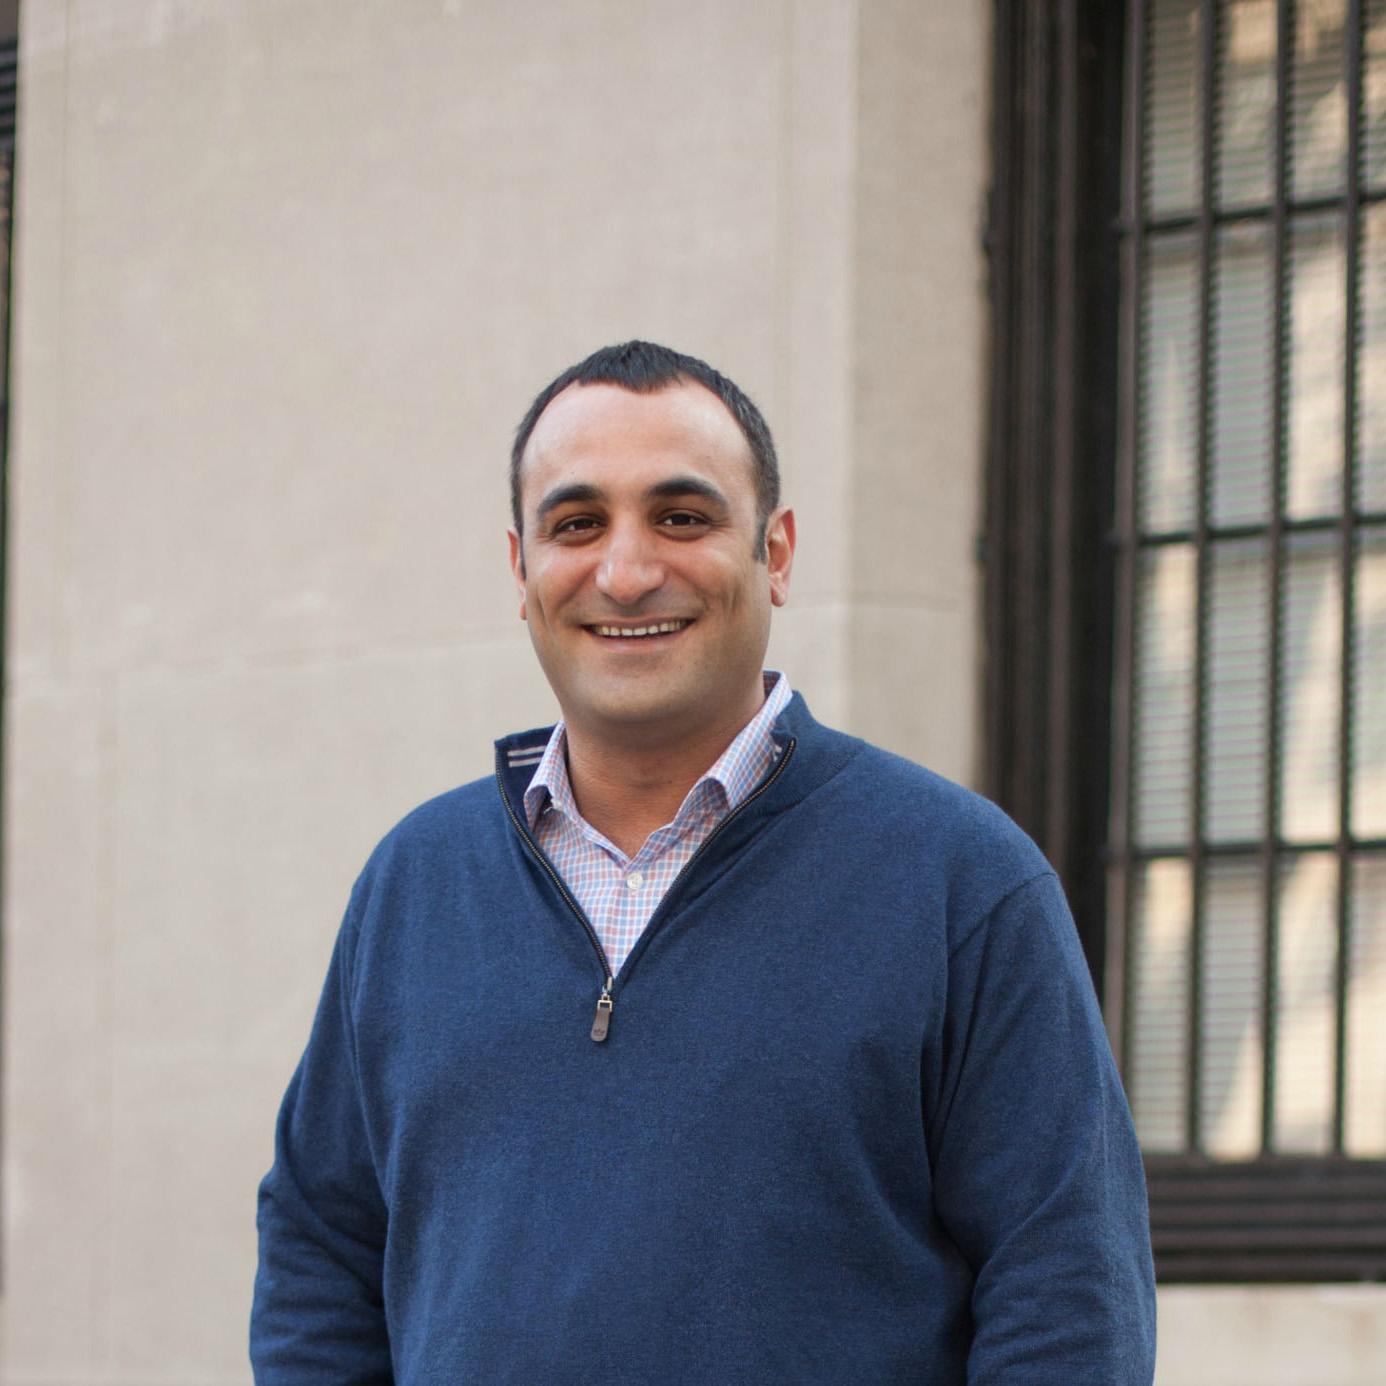 Headshot of Cyrus Seraj, Chicago realtor